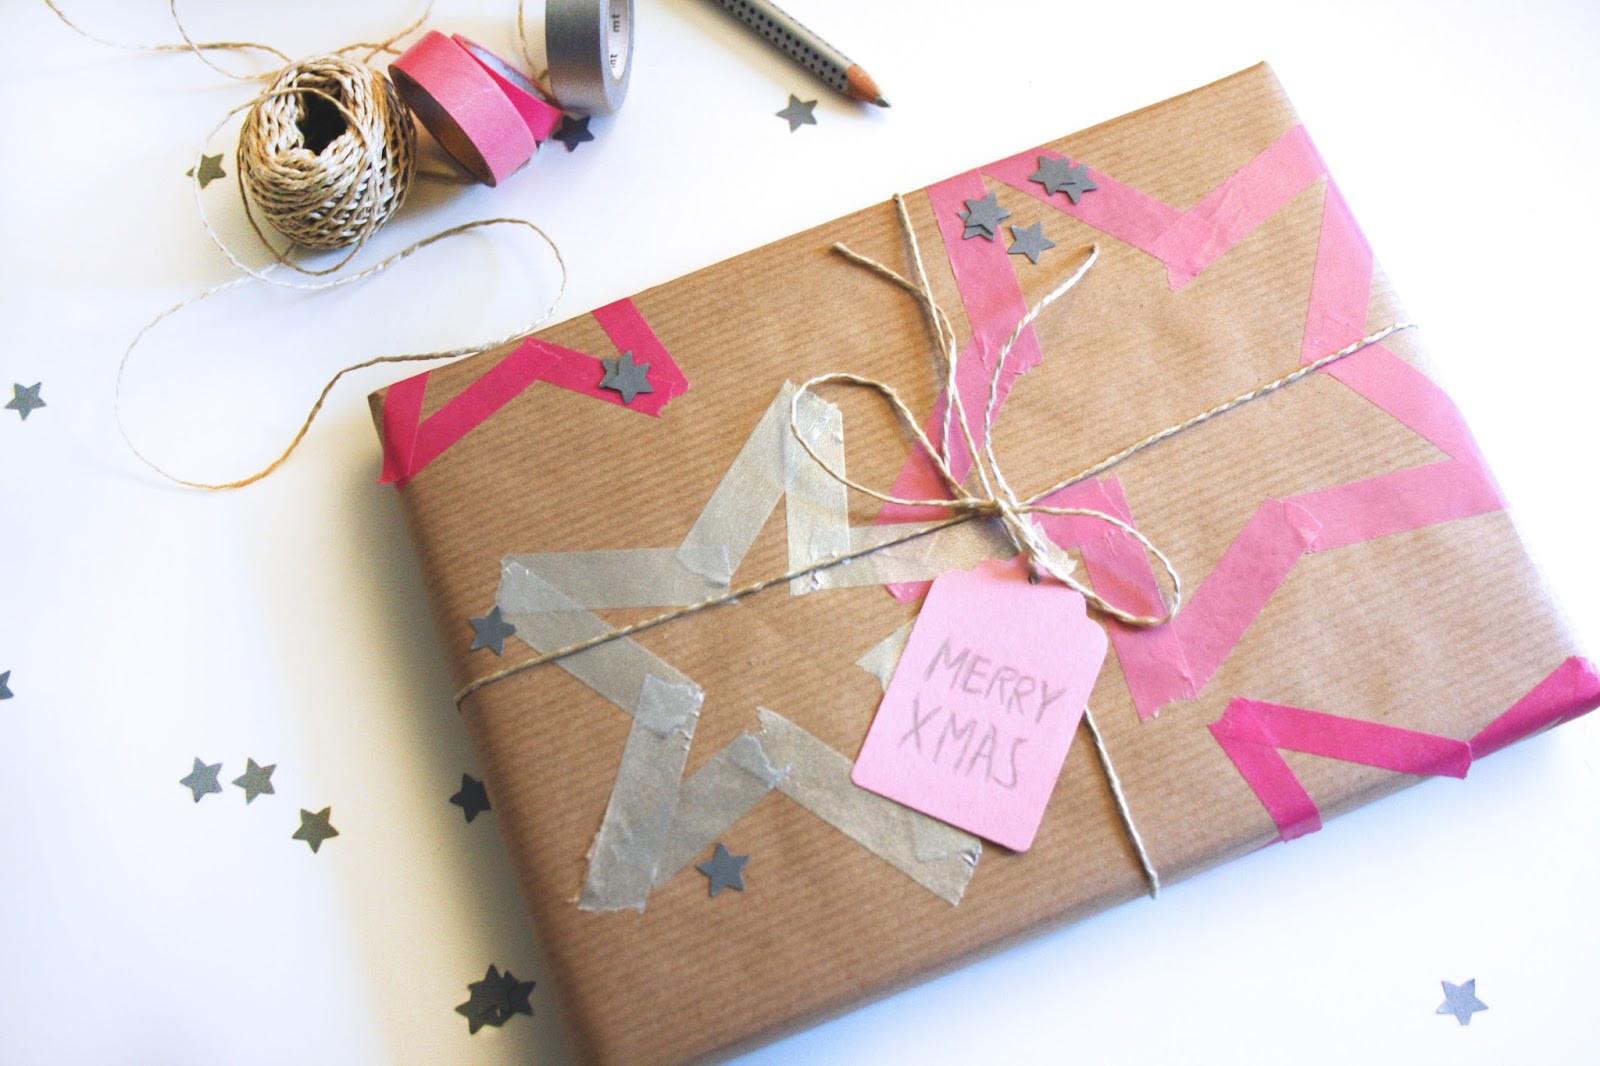 Geschenke Hübsch Verpacken  Wrap it up Geschenke hübsch verpacken 1 pieces for